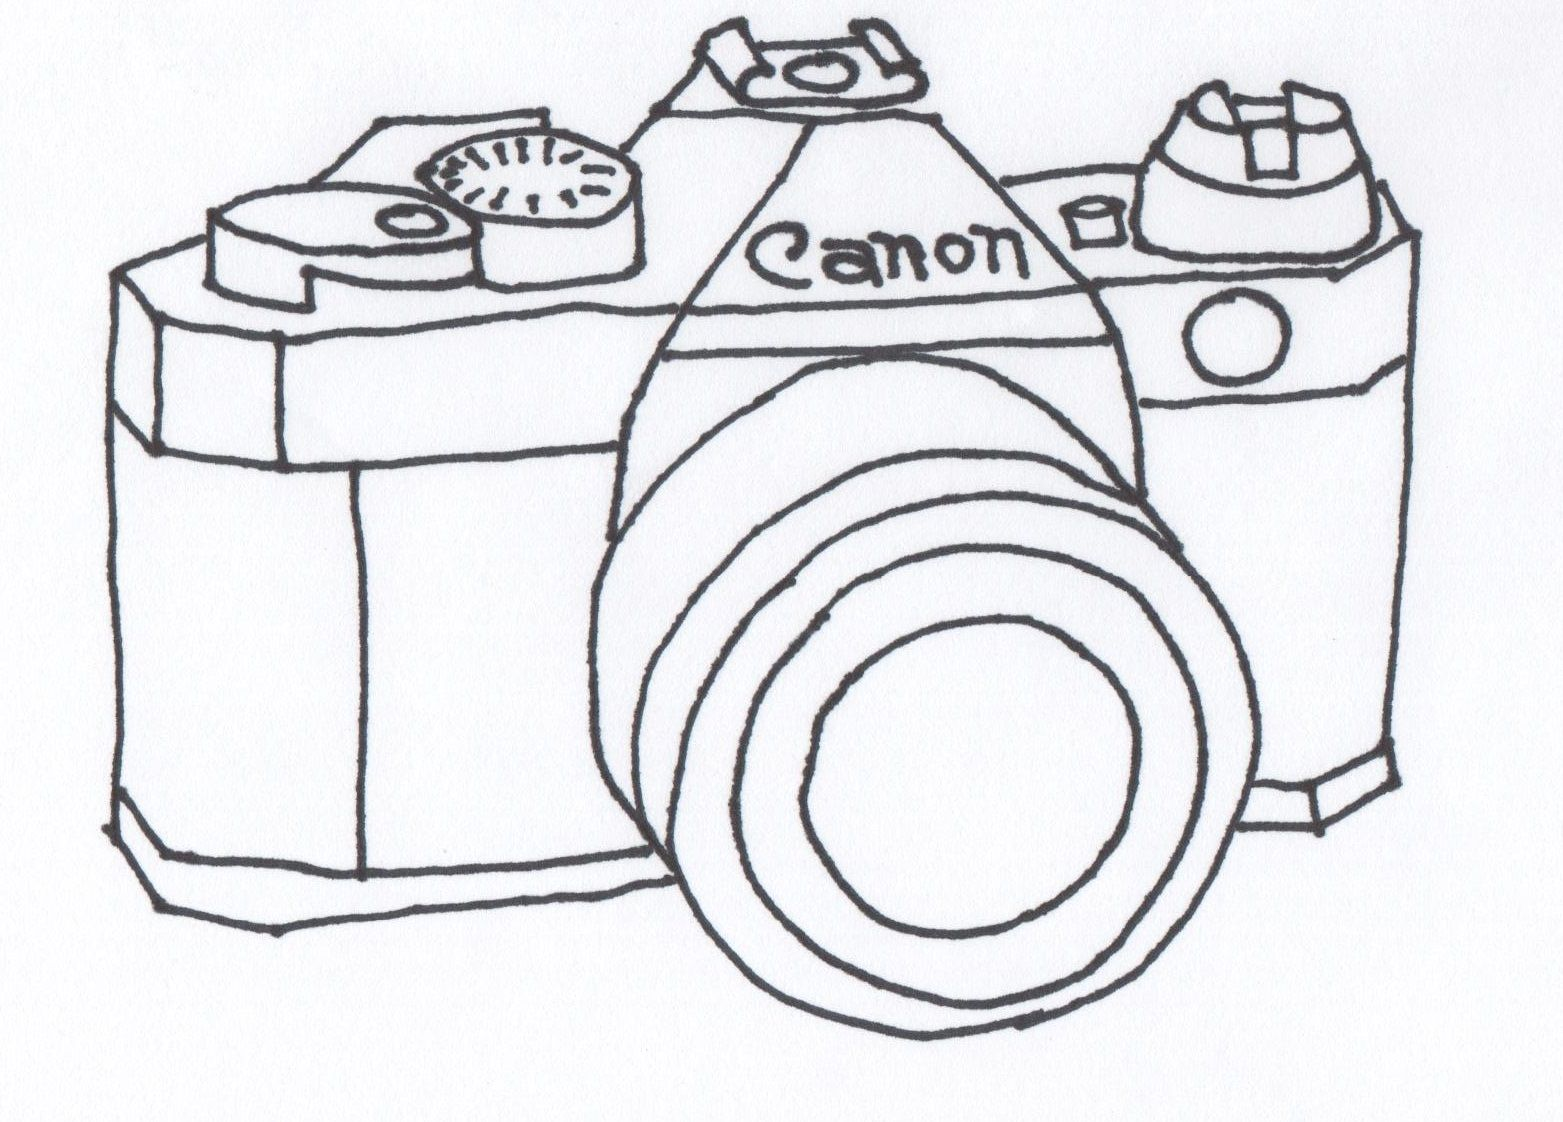 Vintage Camera Drawing | ... the crafty cpa: return on creativity ...